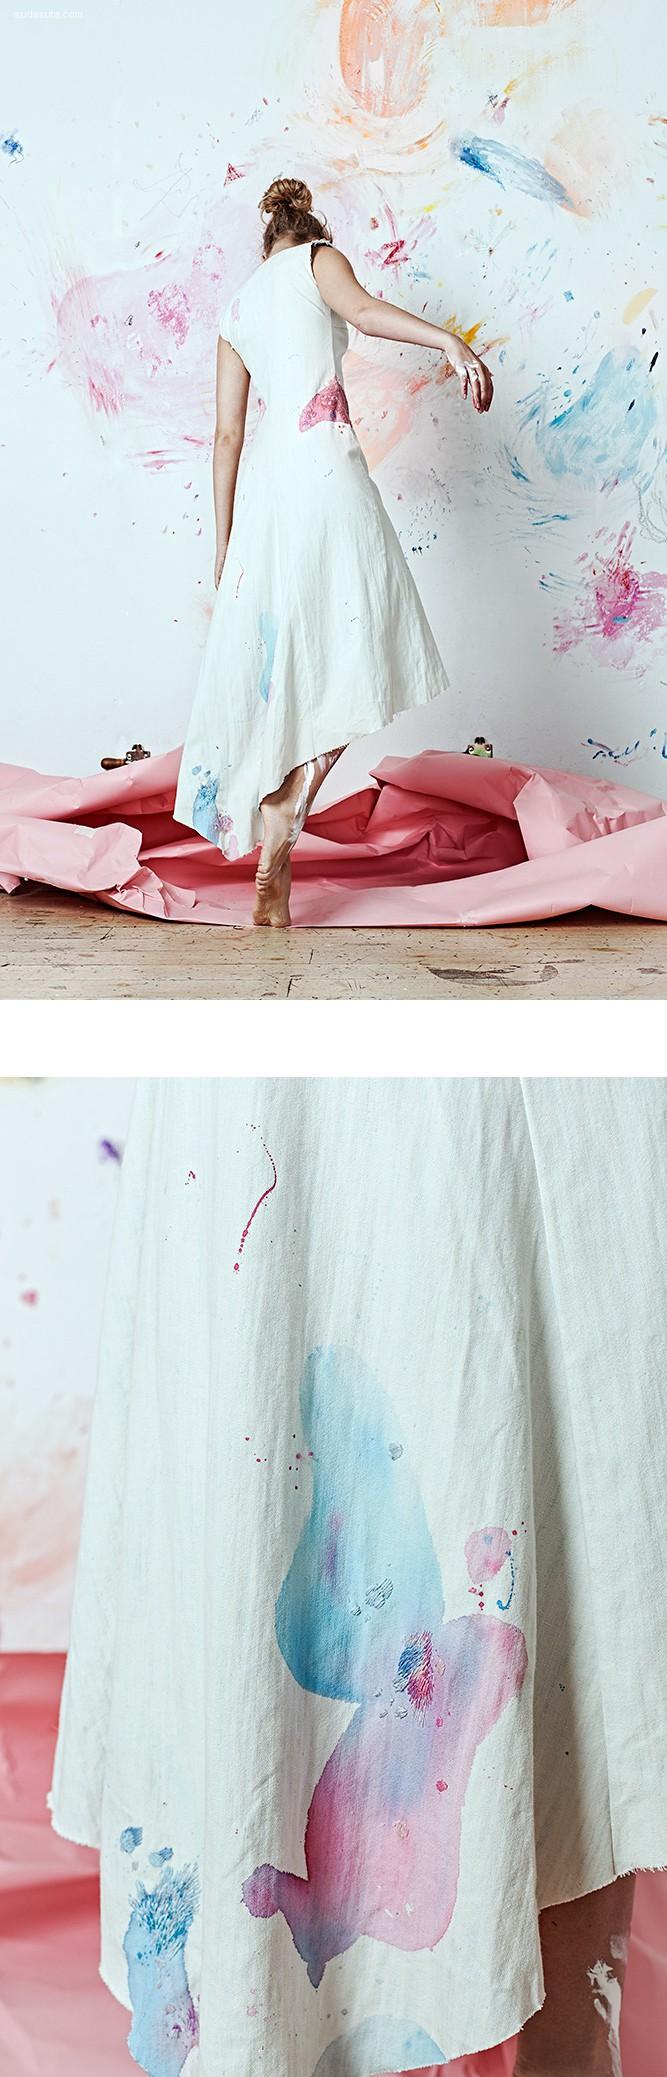 Artist At Home 服装设计欣赏